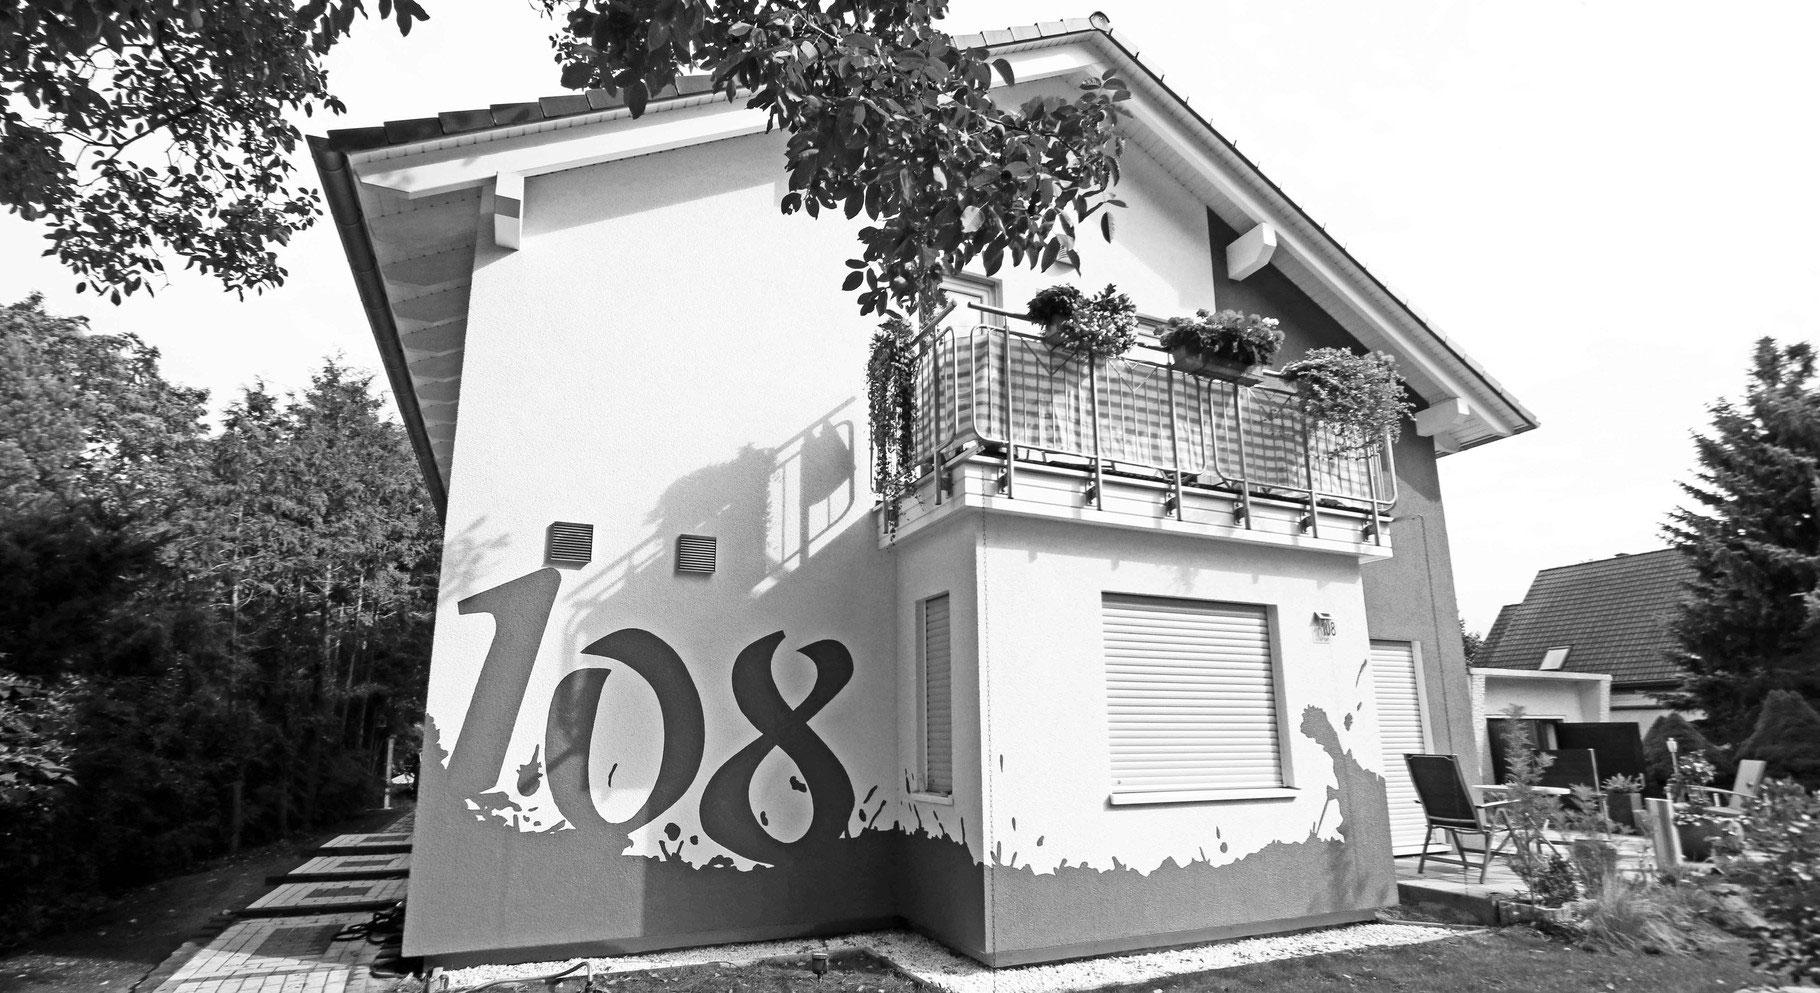 graffitik nstler wandmalerei graffitiauftrag fassadengestaltung. Black Bedroom Furniture Sets. Home Design Ideas